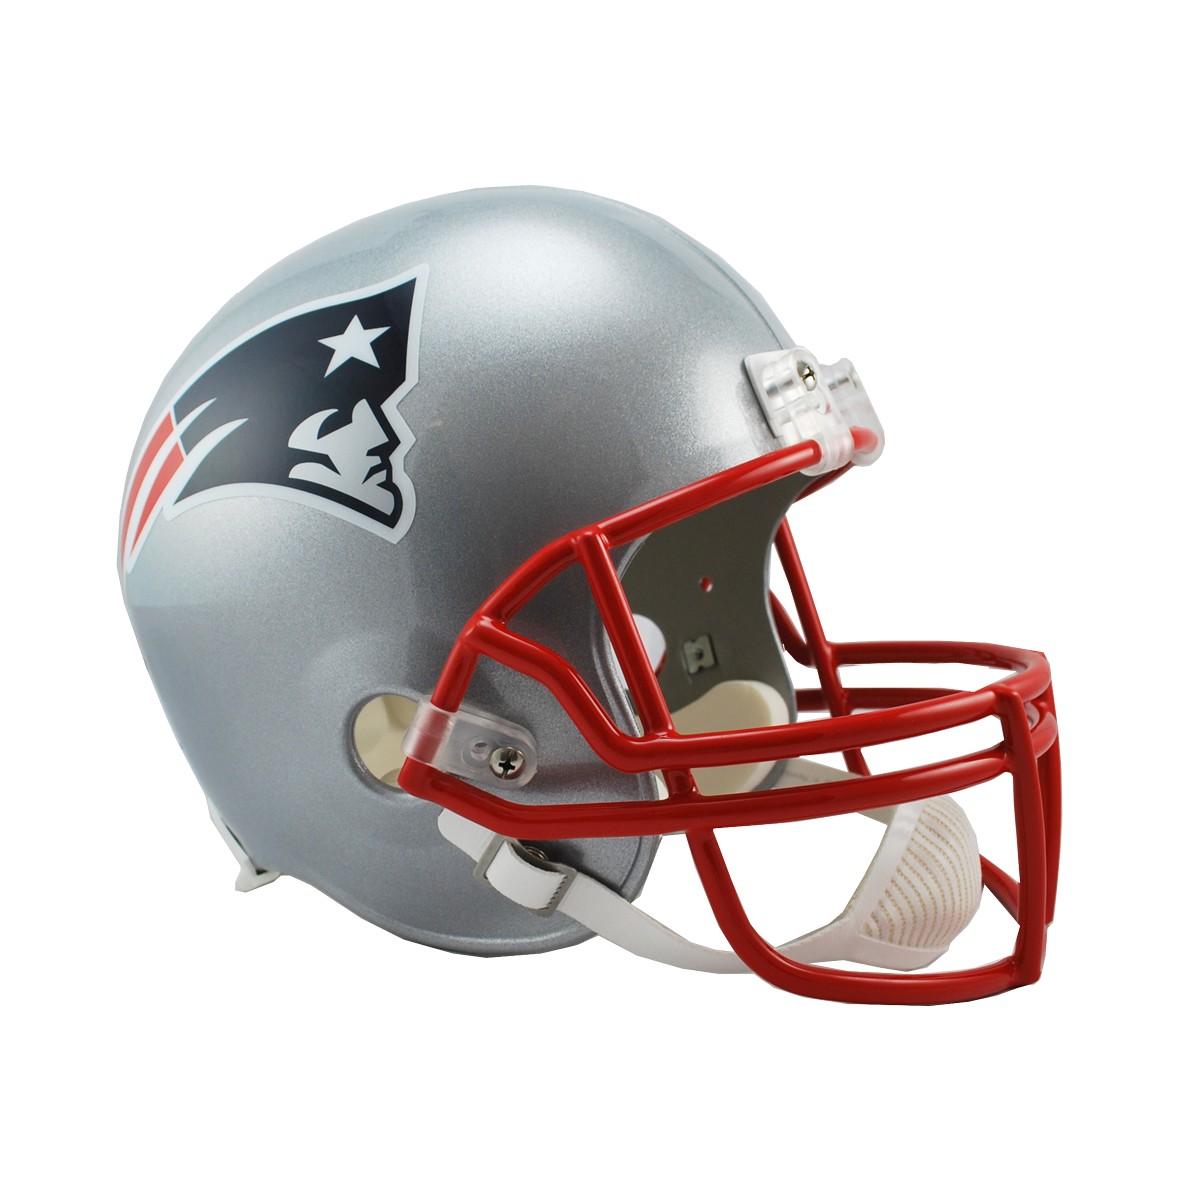 Casco Riddell Vsr4 Replica New England Patriots Gadgets